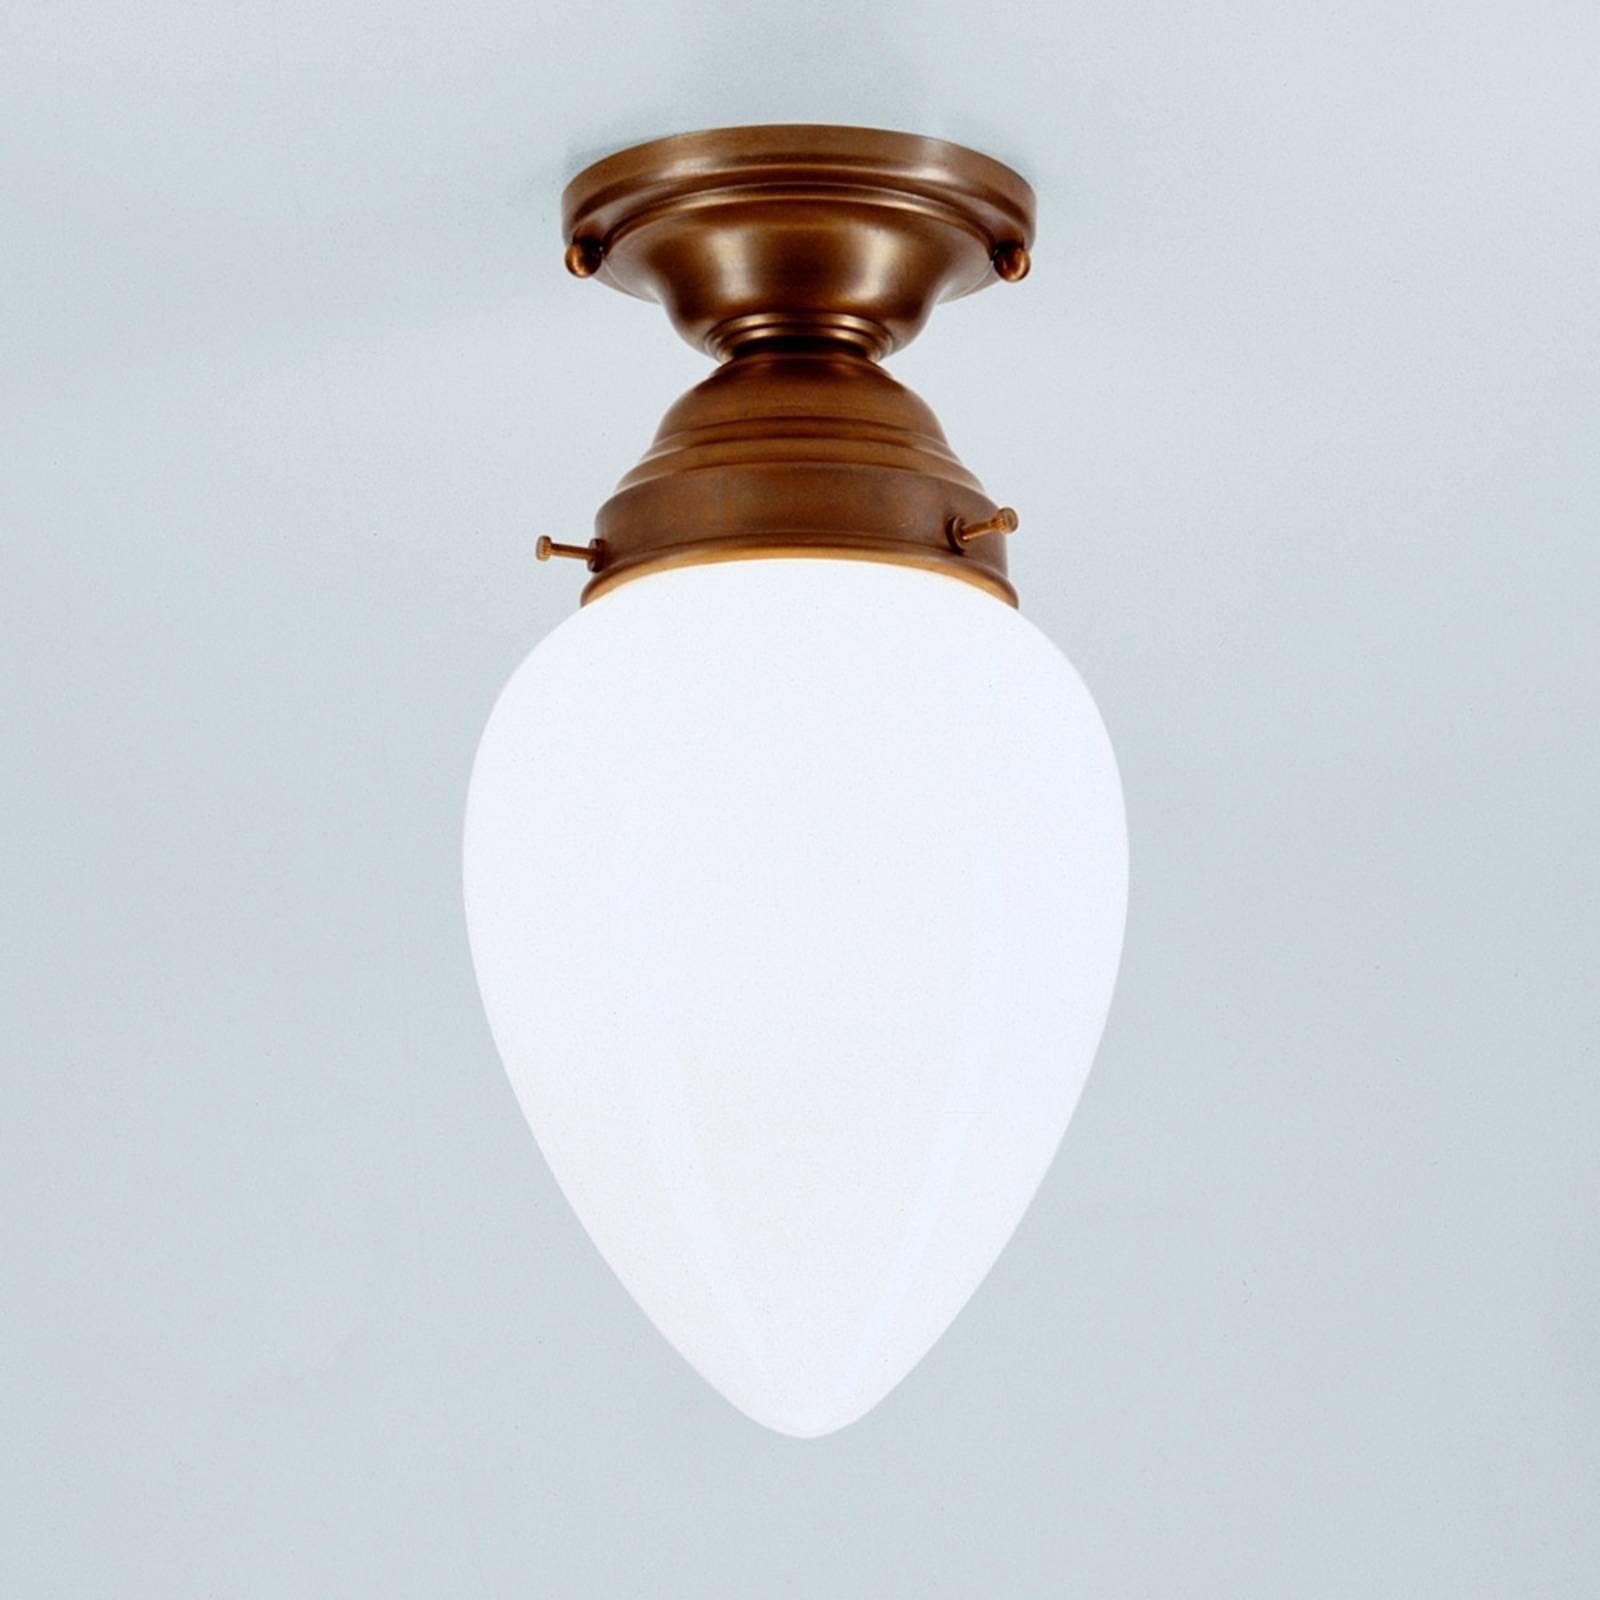 Bill - een plafondlamp made in Germany